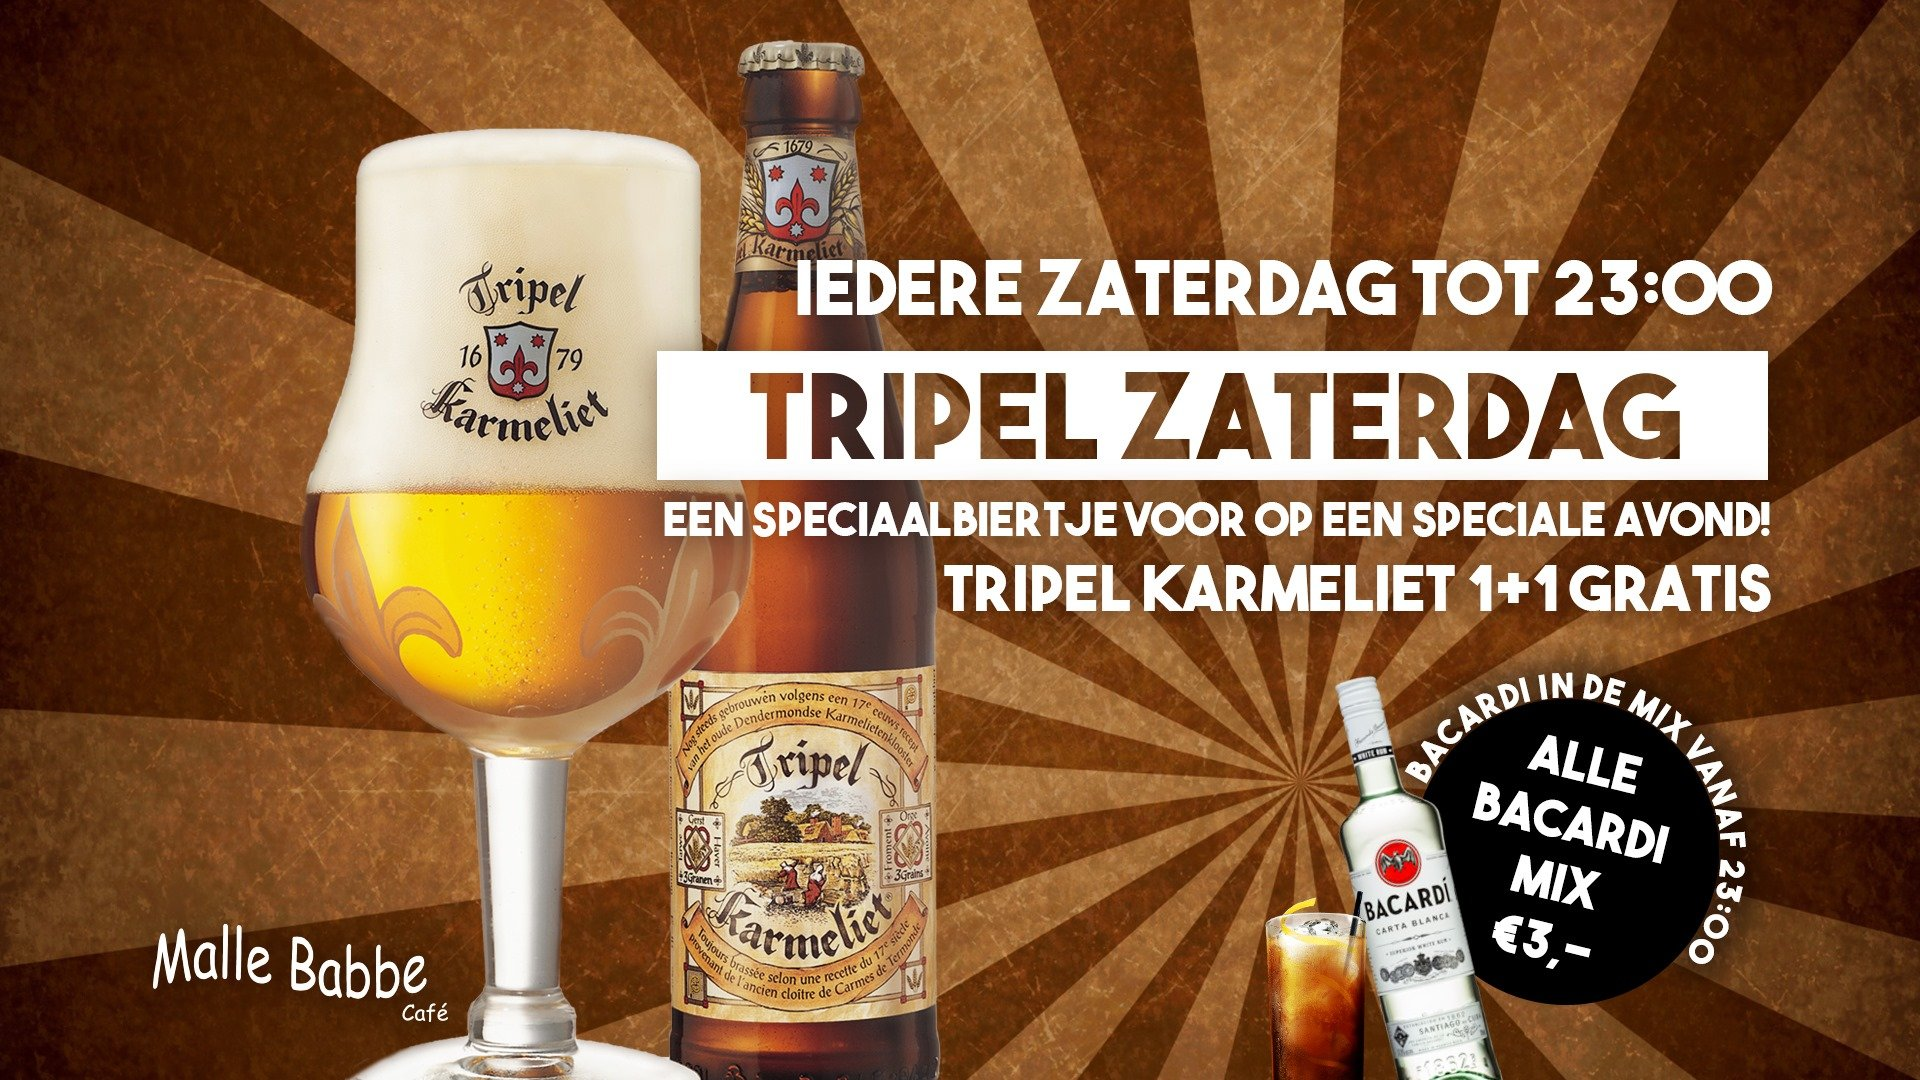 Tripel Zaterdag & Bacardi in de mix